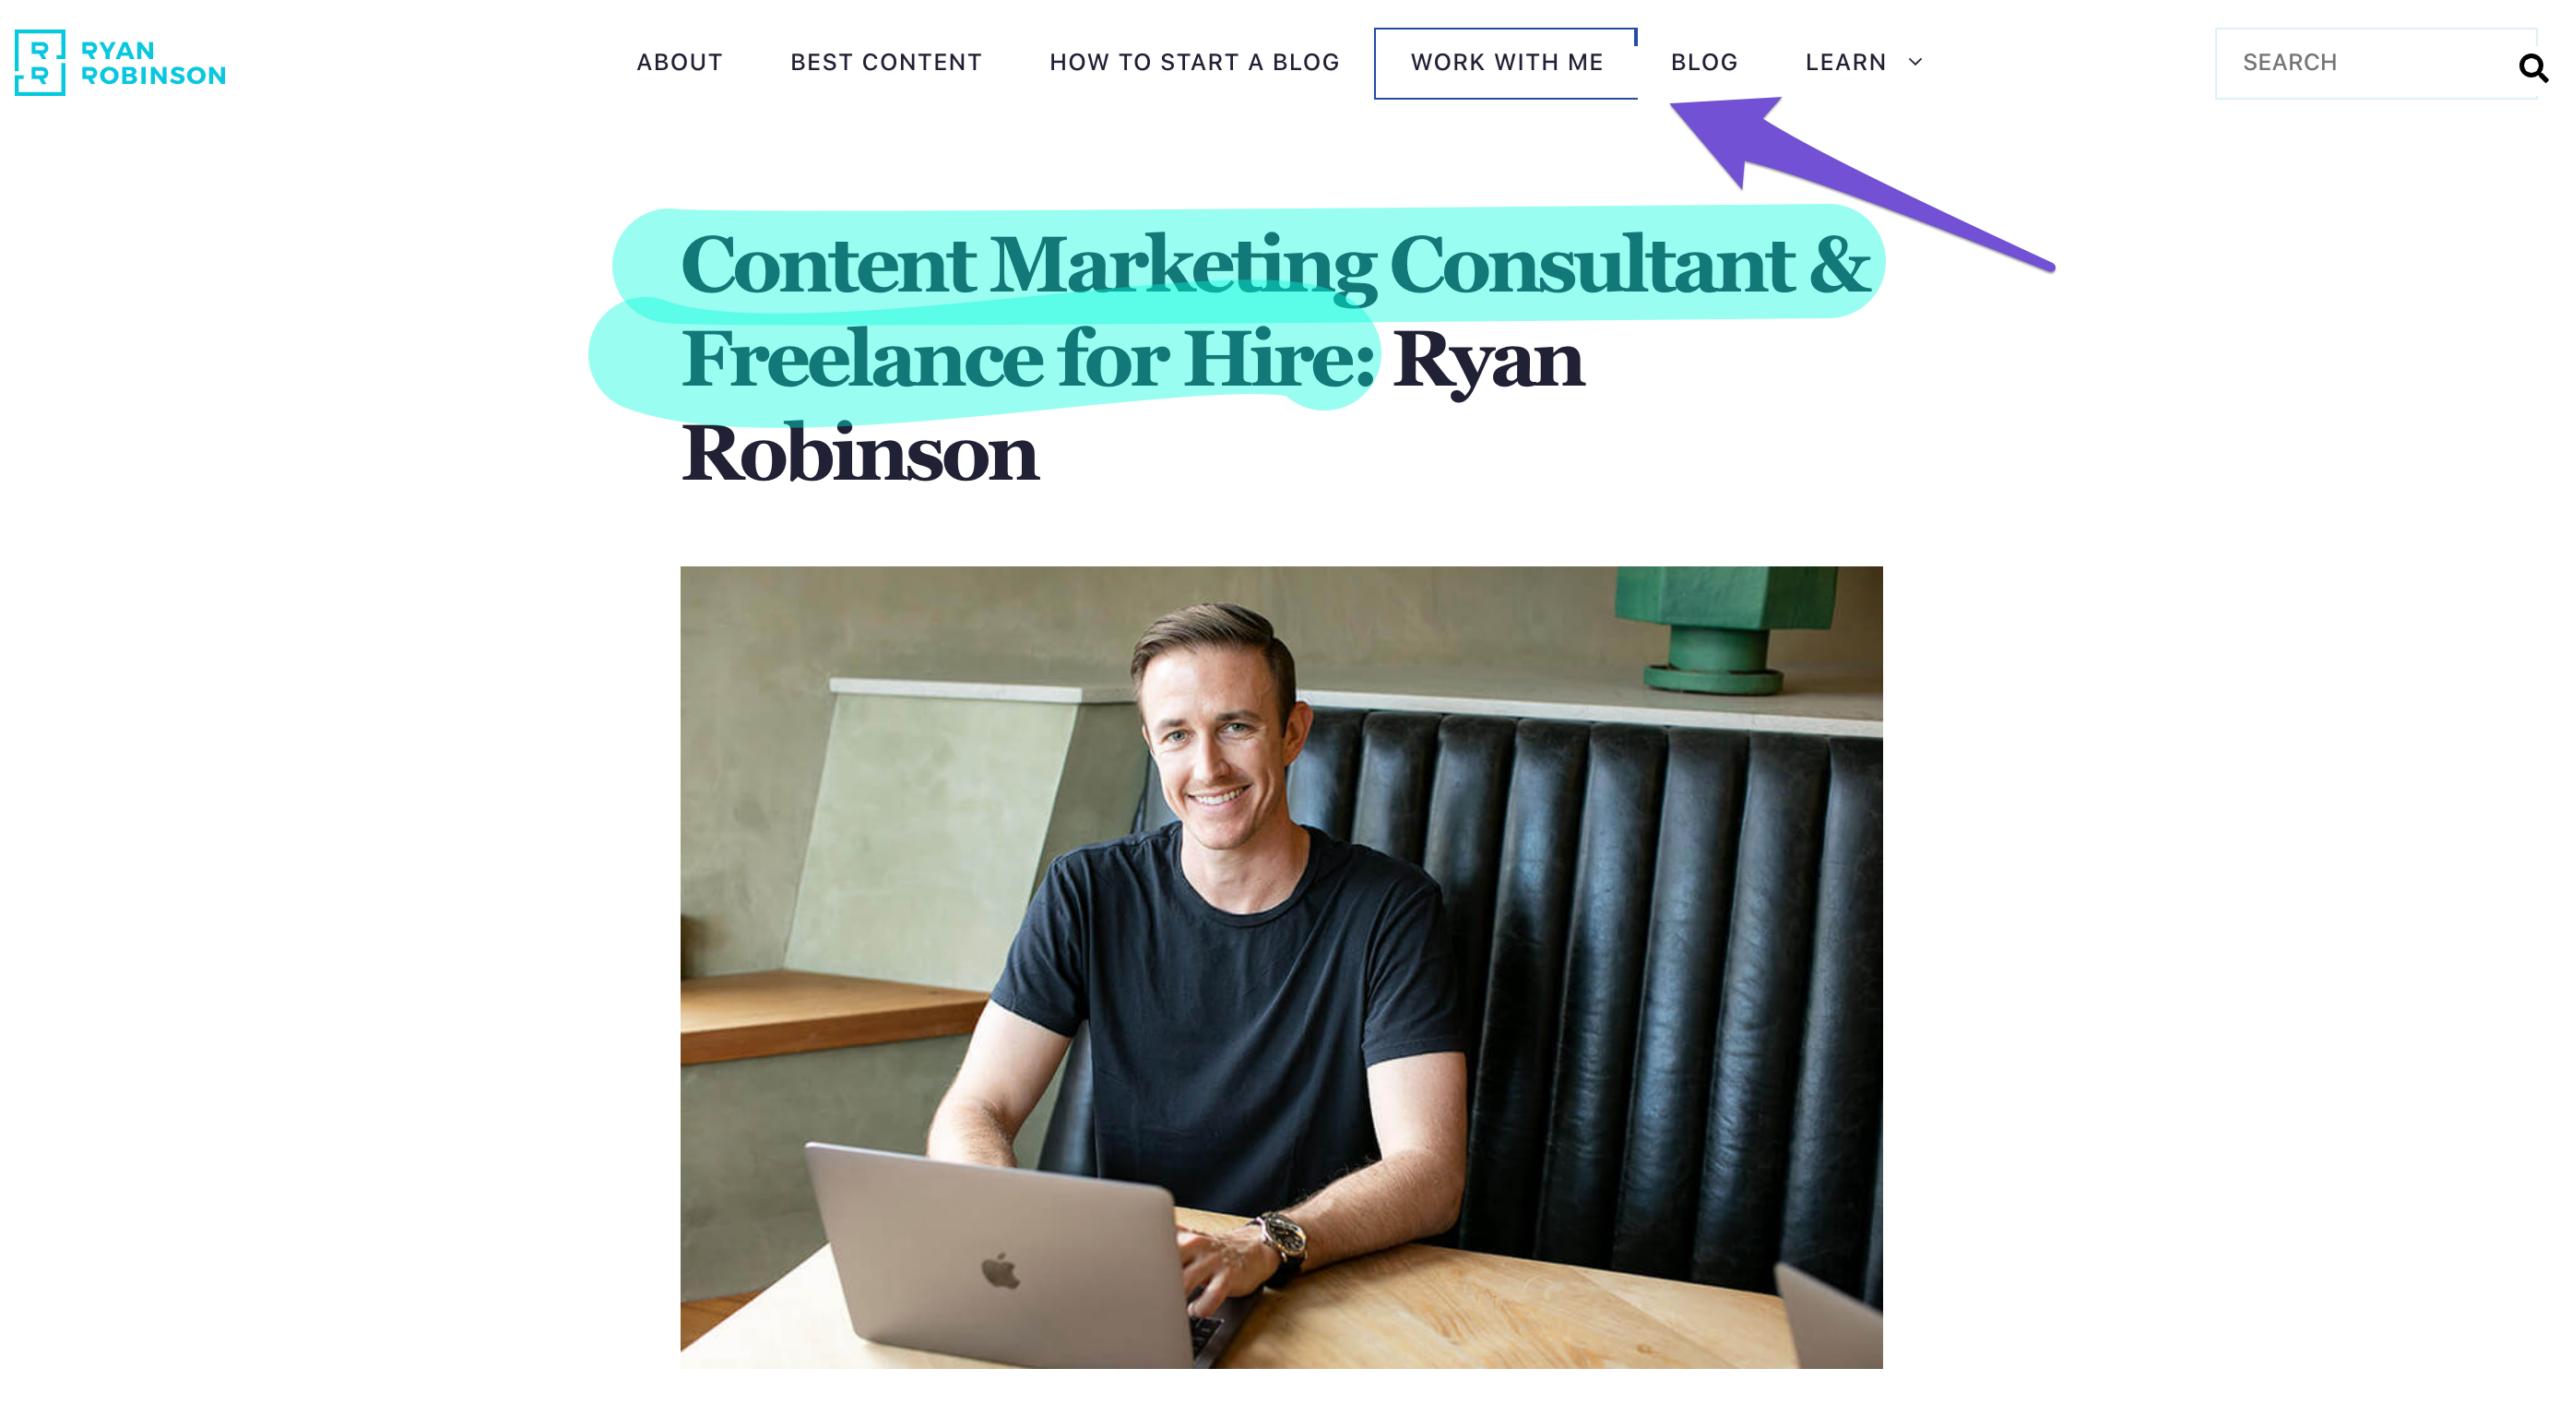 ryan robinson hire me page